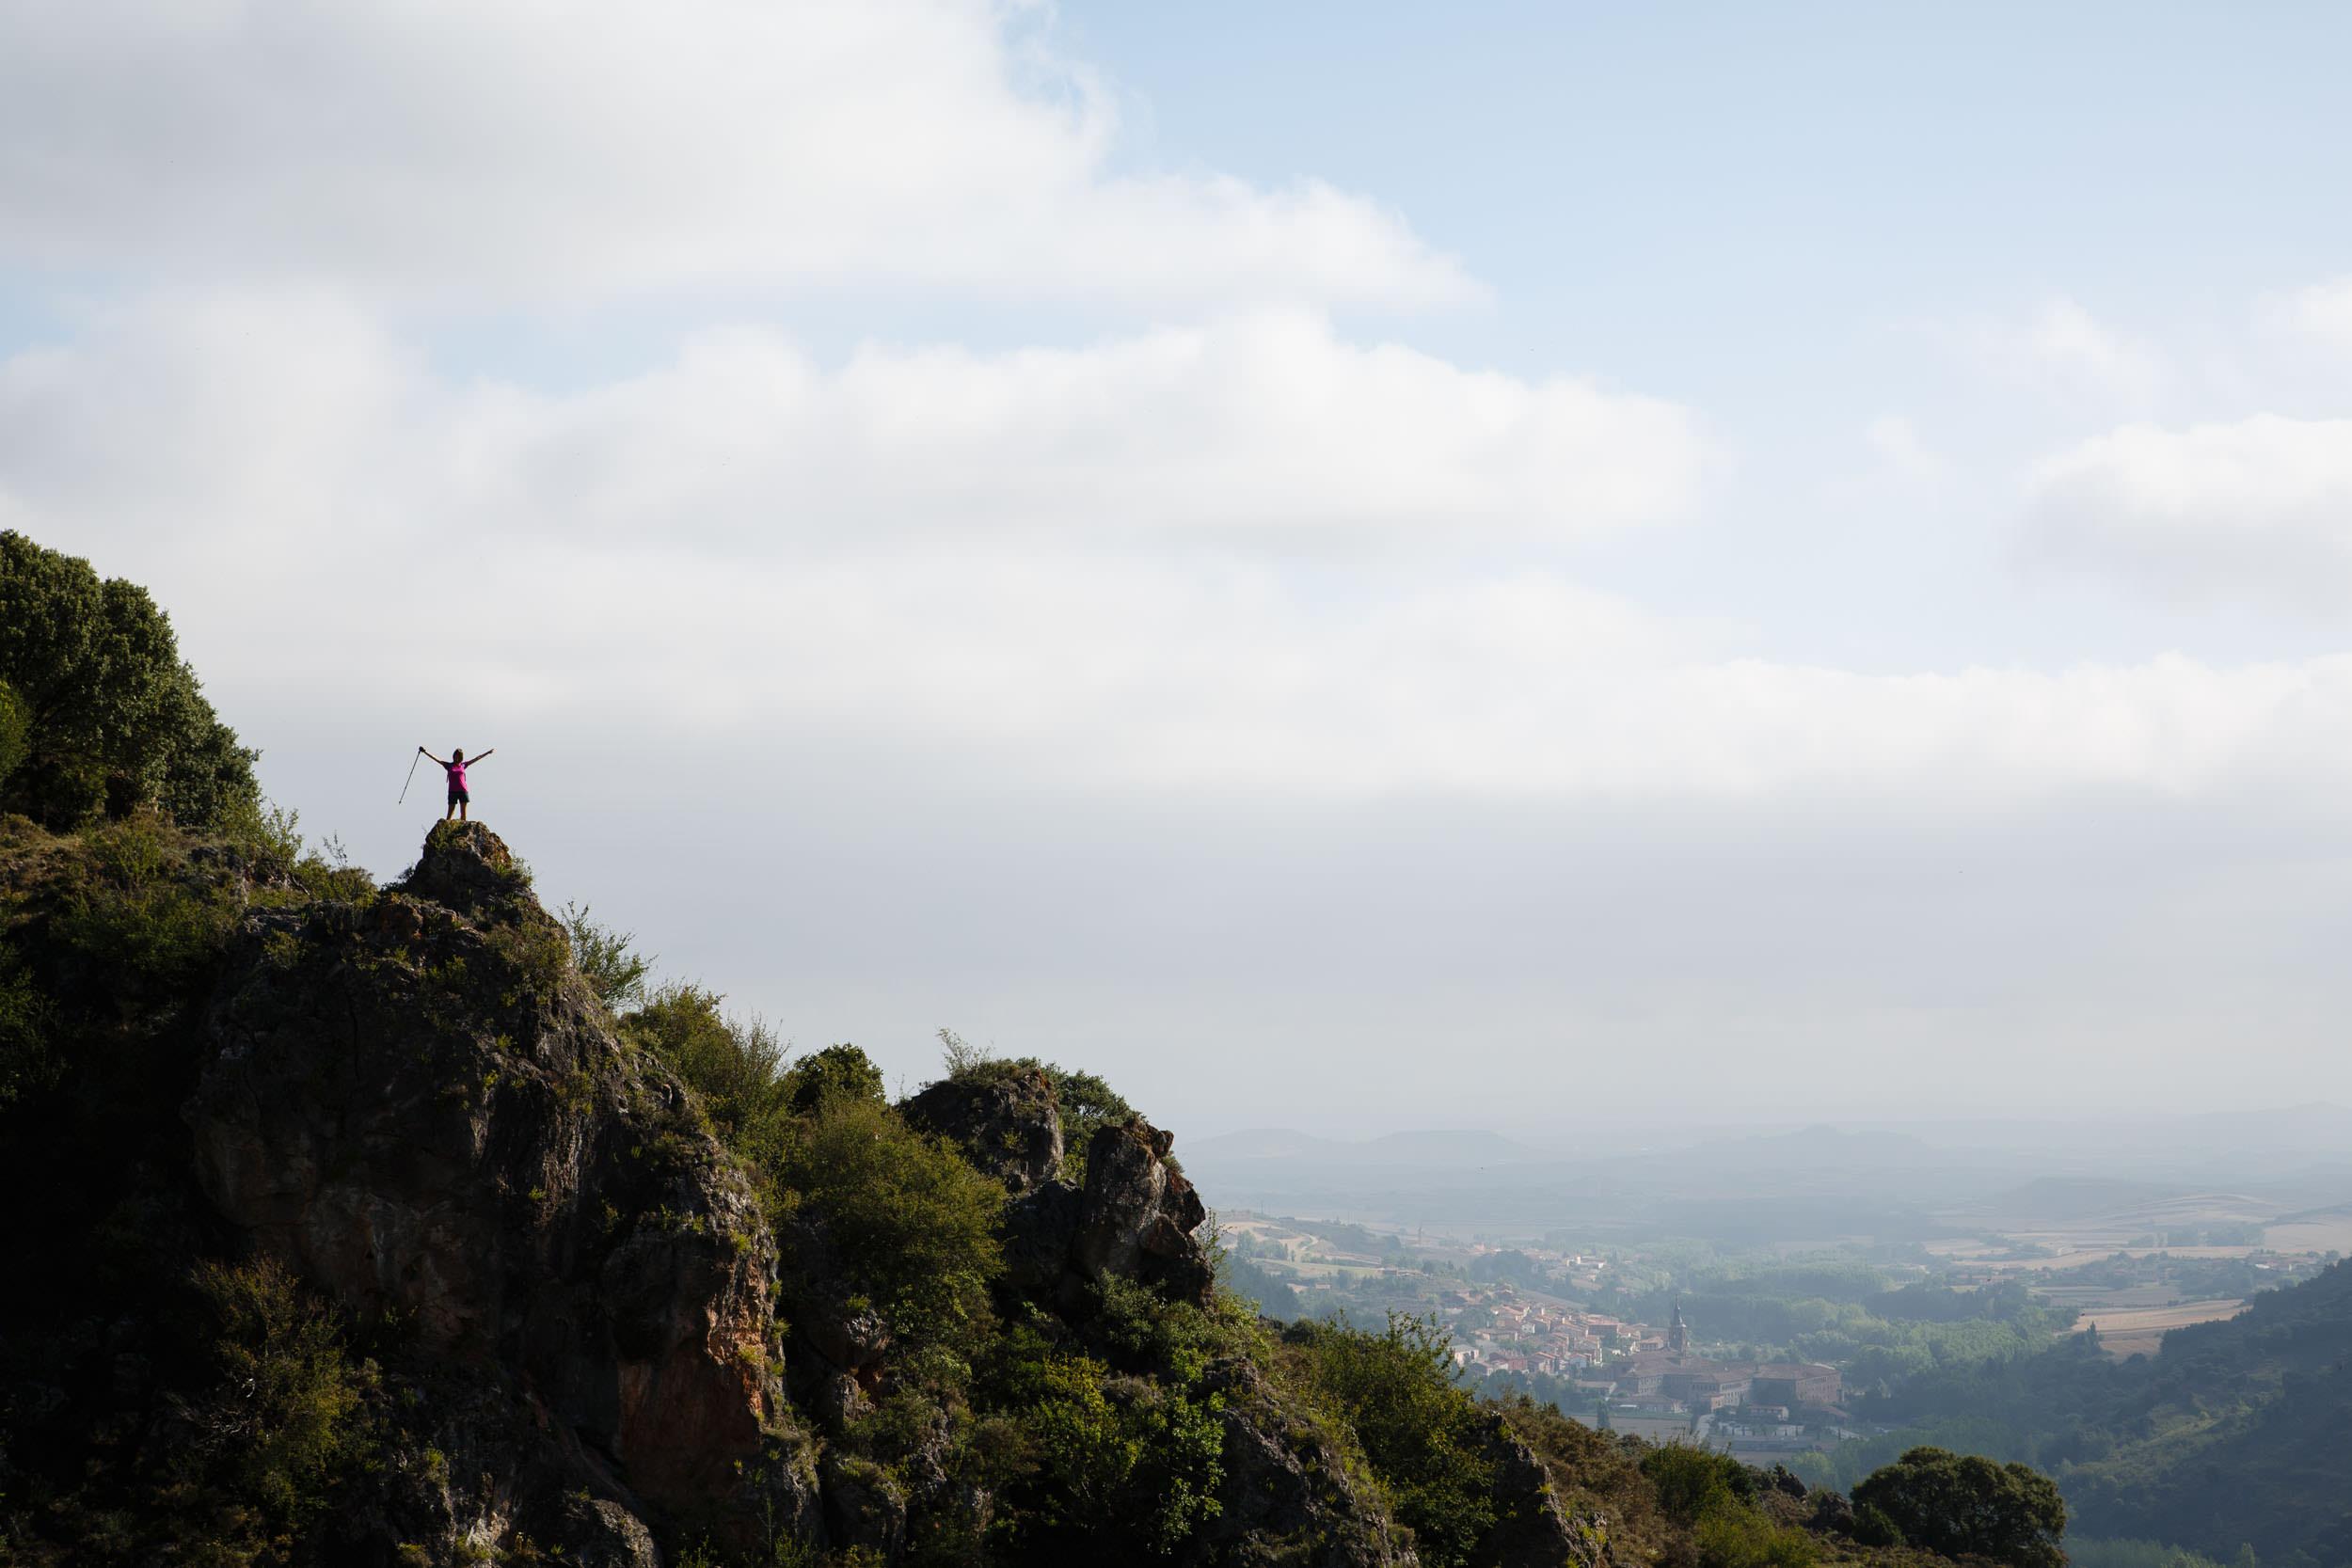 Publicity and website photography in La Rioja - James Sturcke | sturcke.org